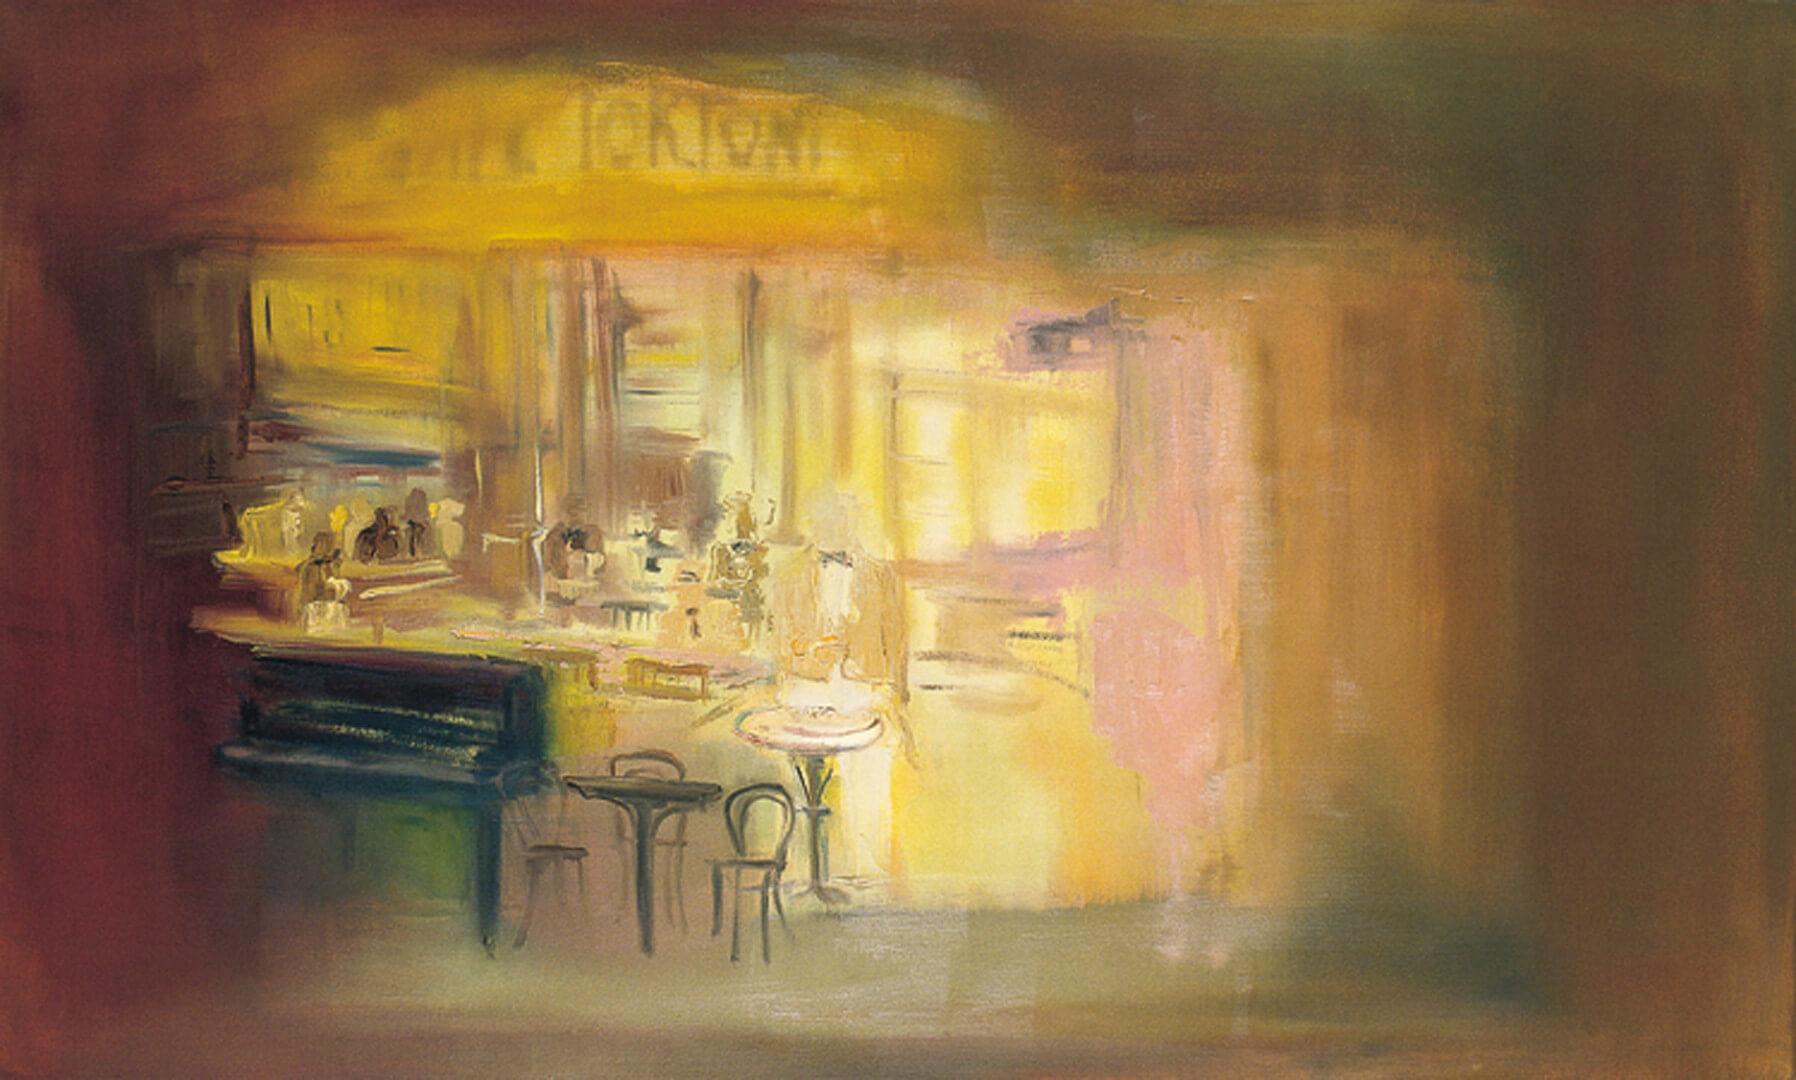 2007 - Oil on canvas. 70 cm. x 140 cm.